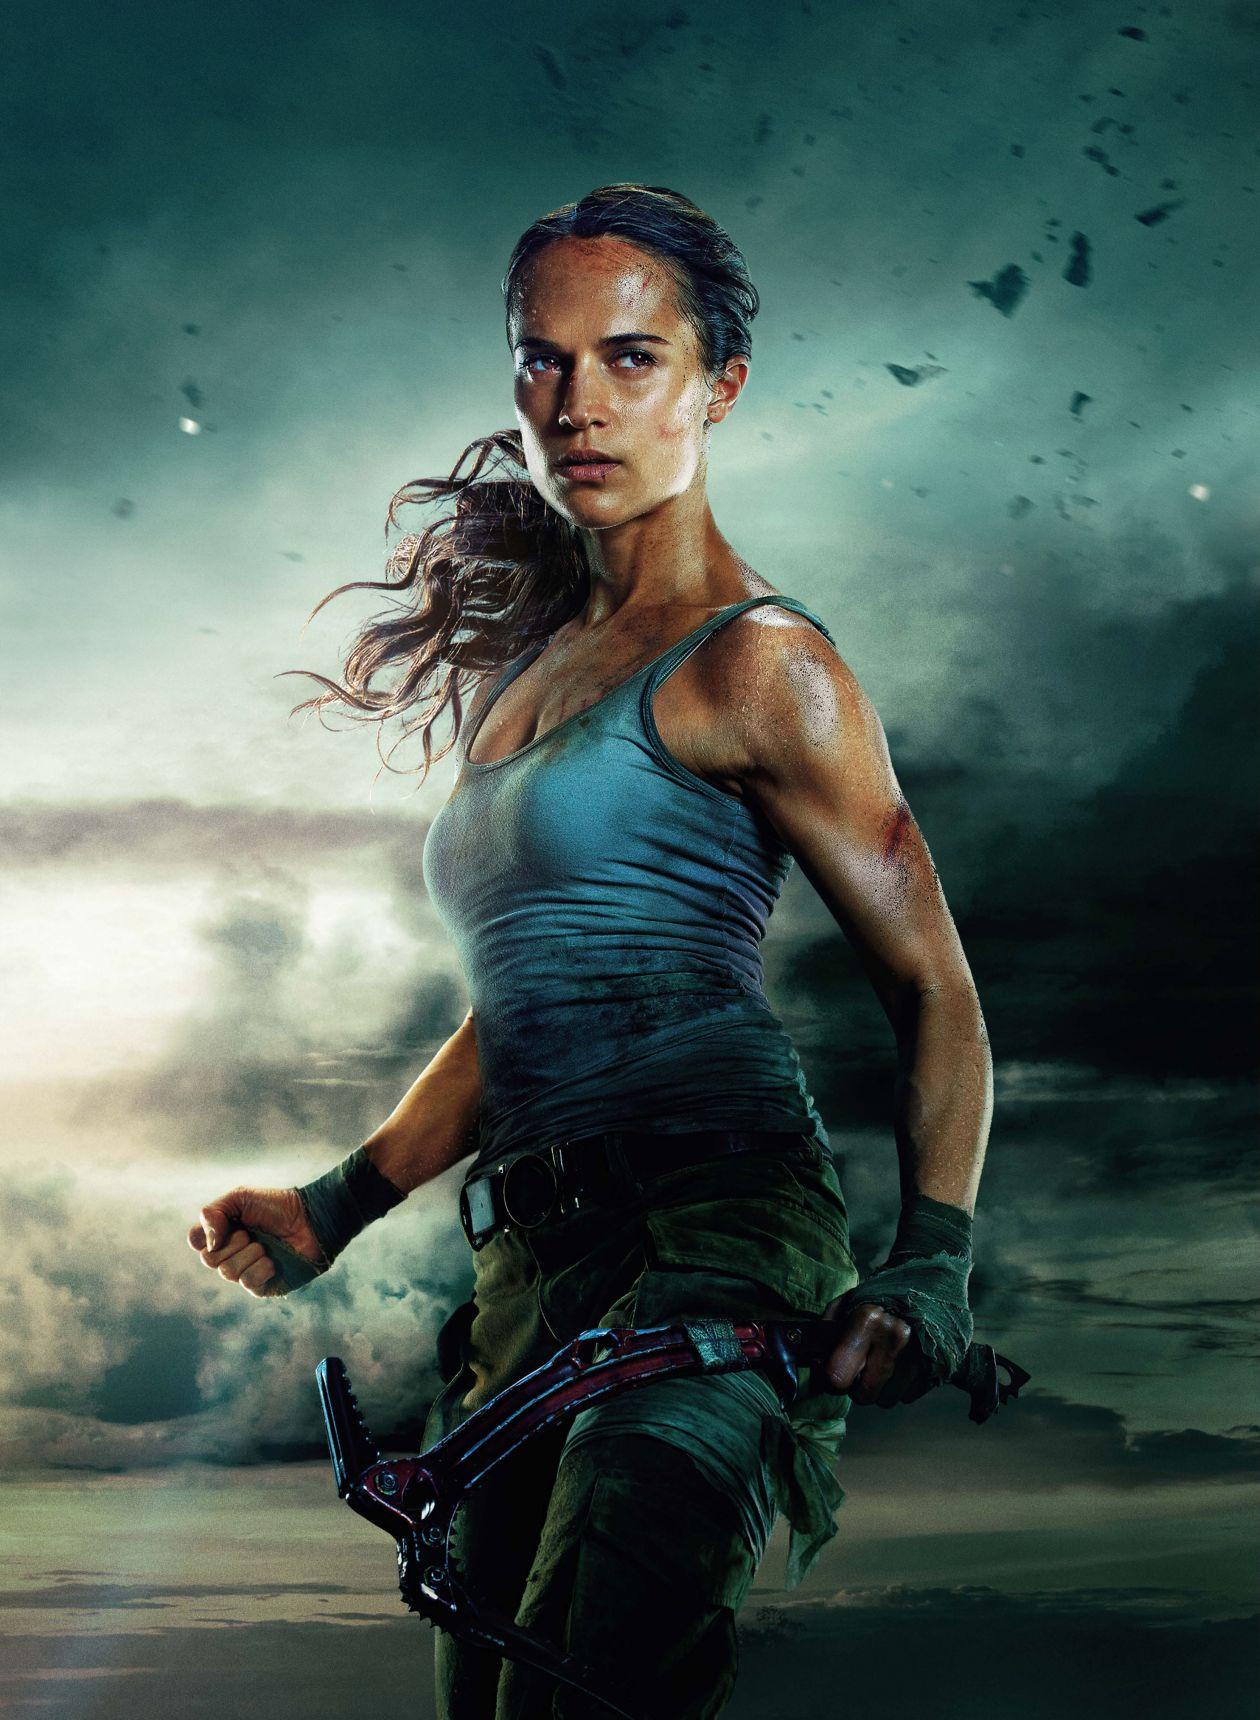 Alicia Vikander actress / Lara Croft / Tomb Raider 2018 Movie Teaser Poster / Affiche Teaser film